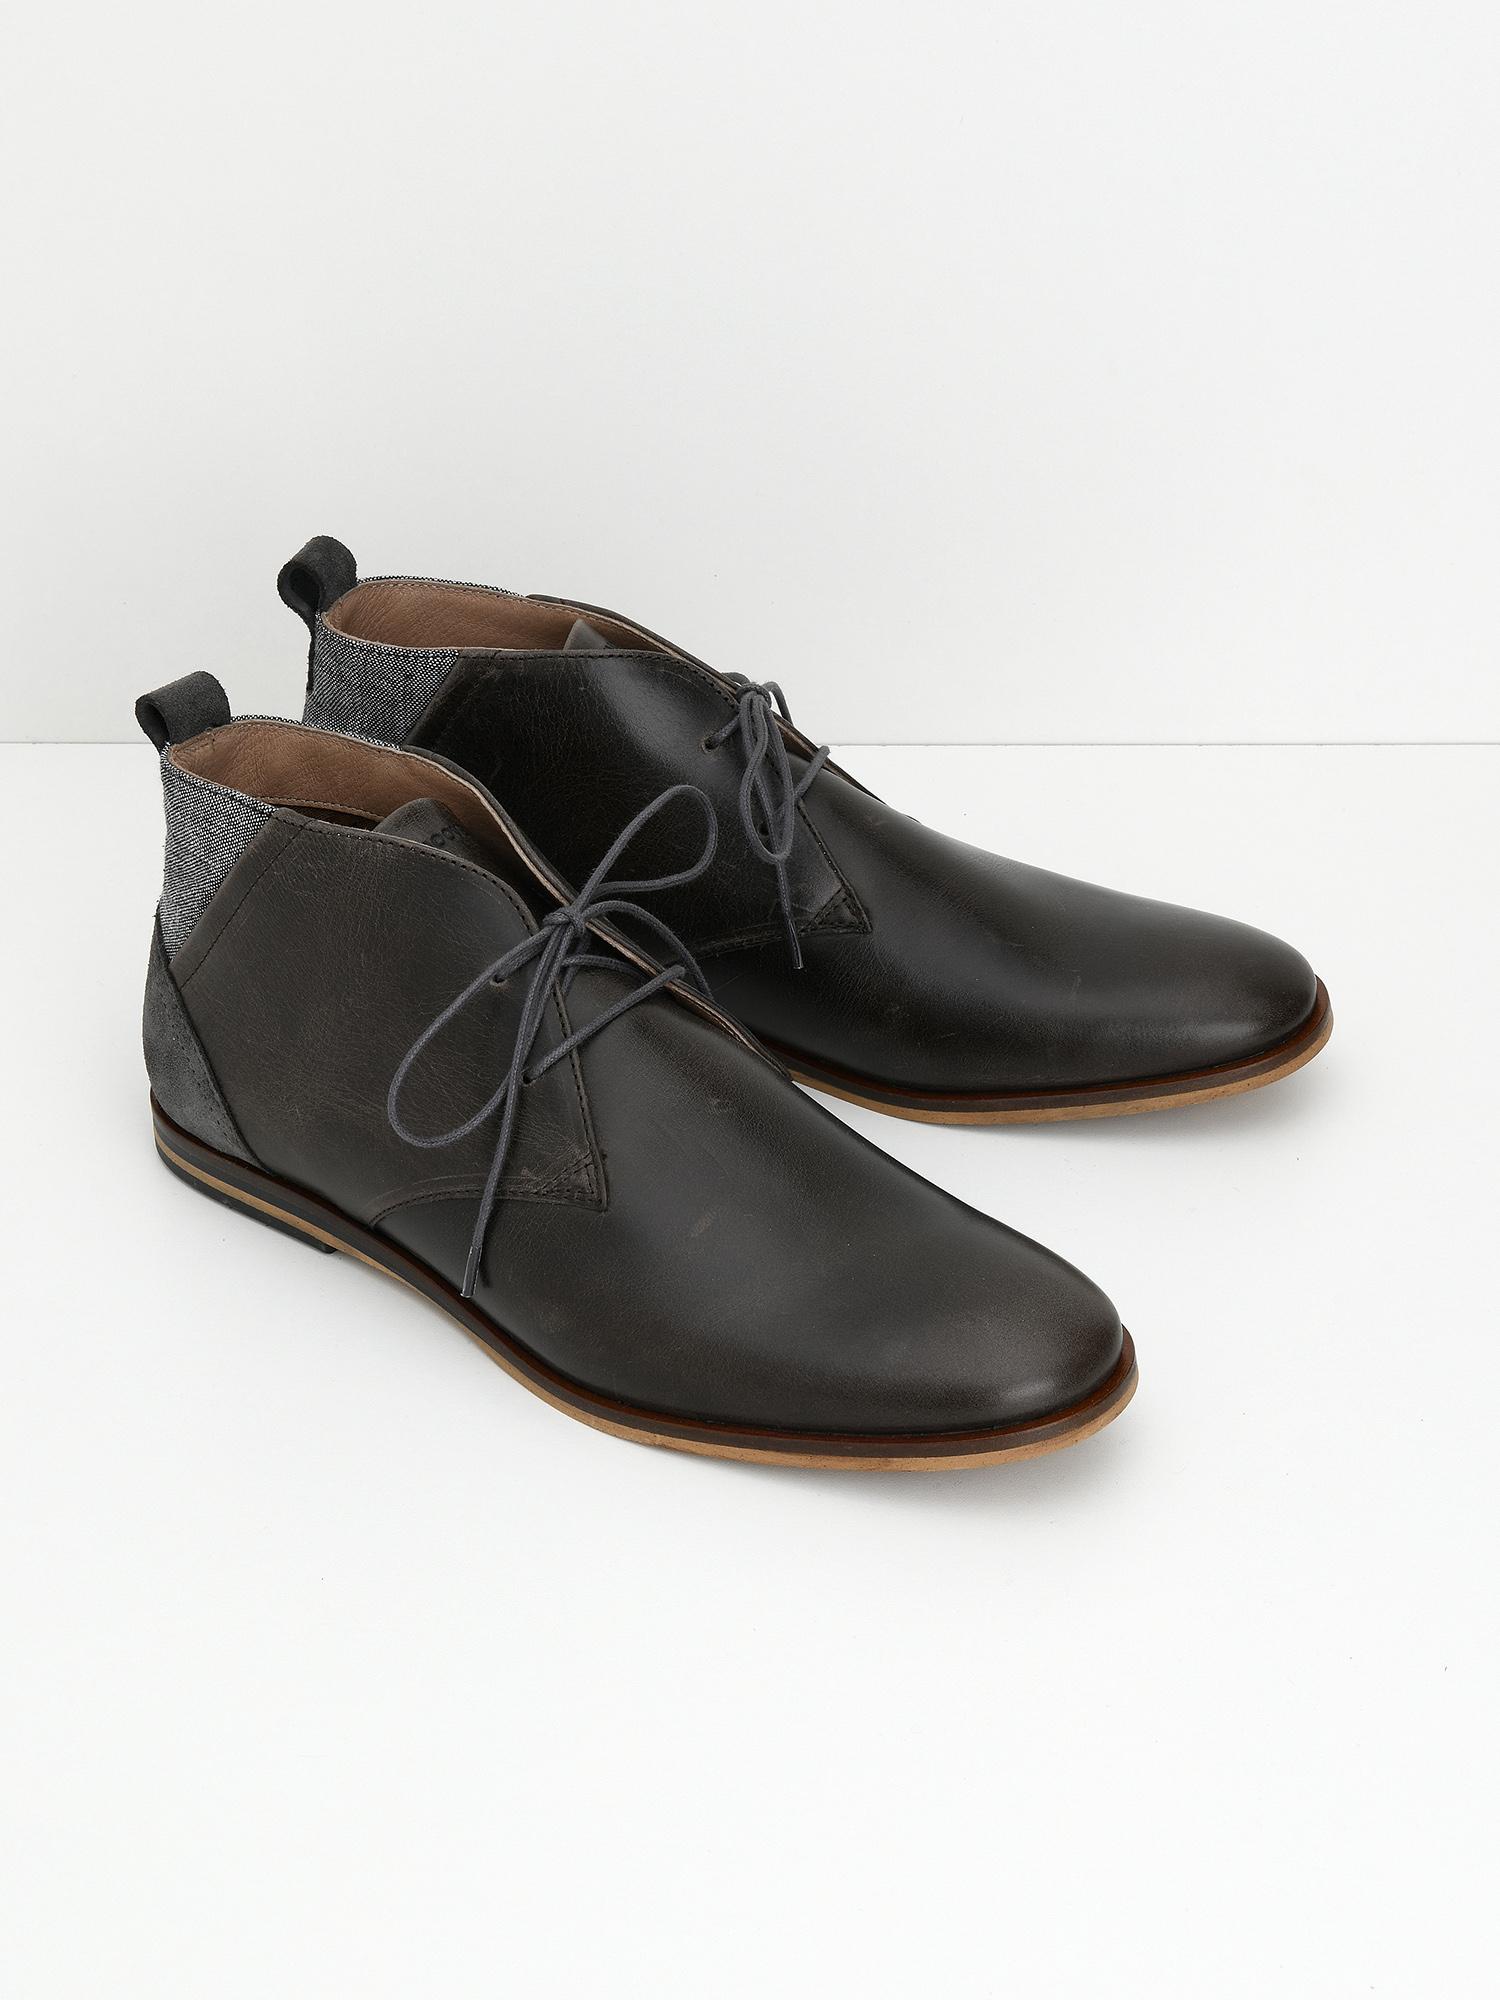 chaussure mariage pour homme que choisir. Black Bedroom Furniture Sets. Home Design Ideas